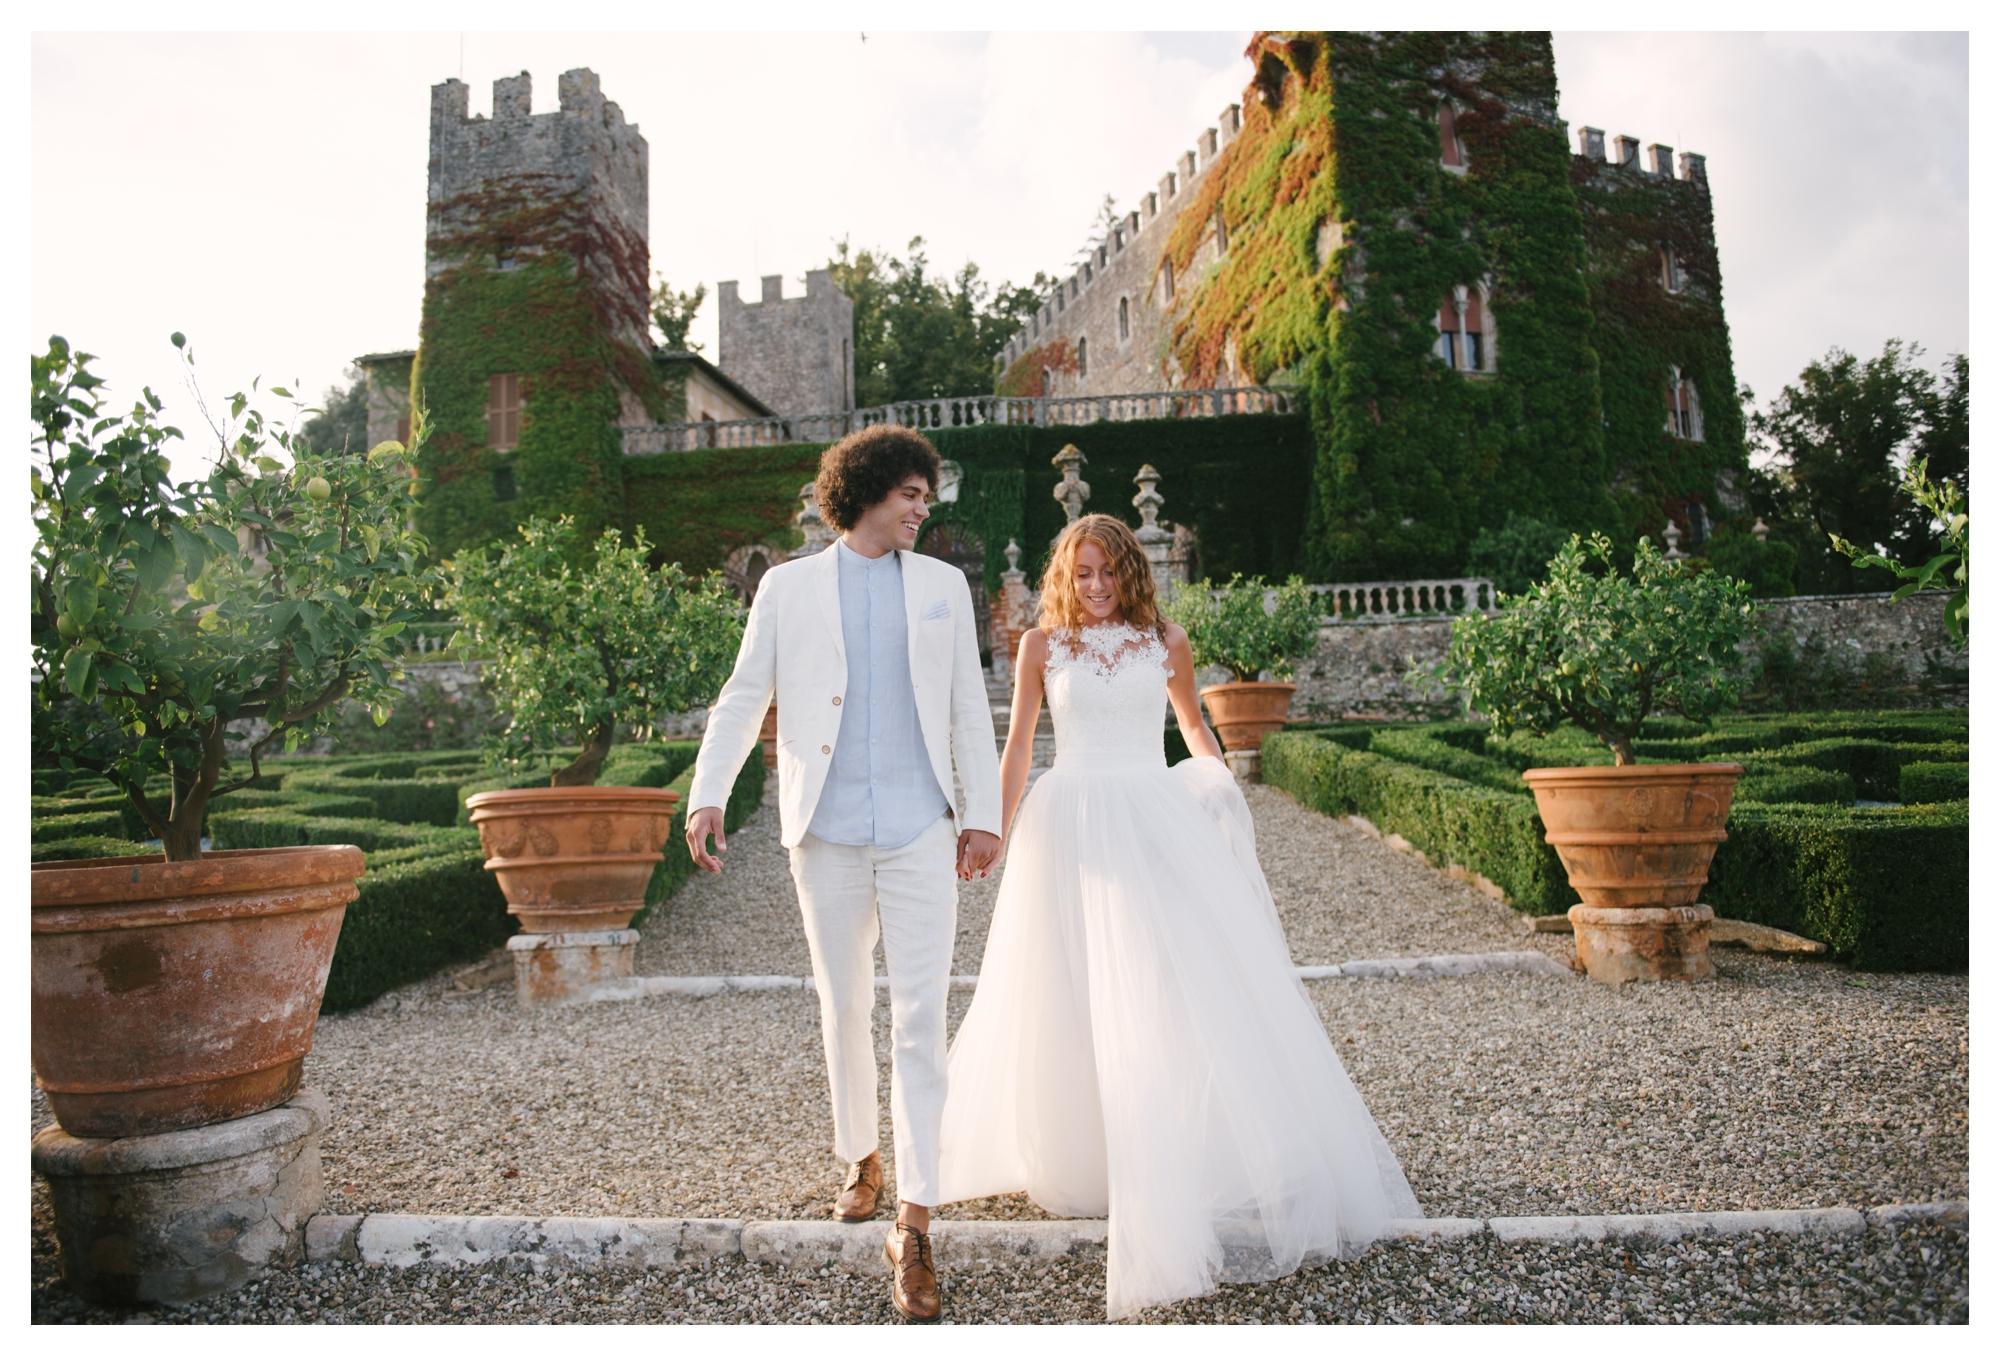 tuscany-castle-wedding-photographer-italy-williamsburgphotostudios-_0016.jpg